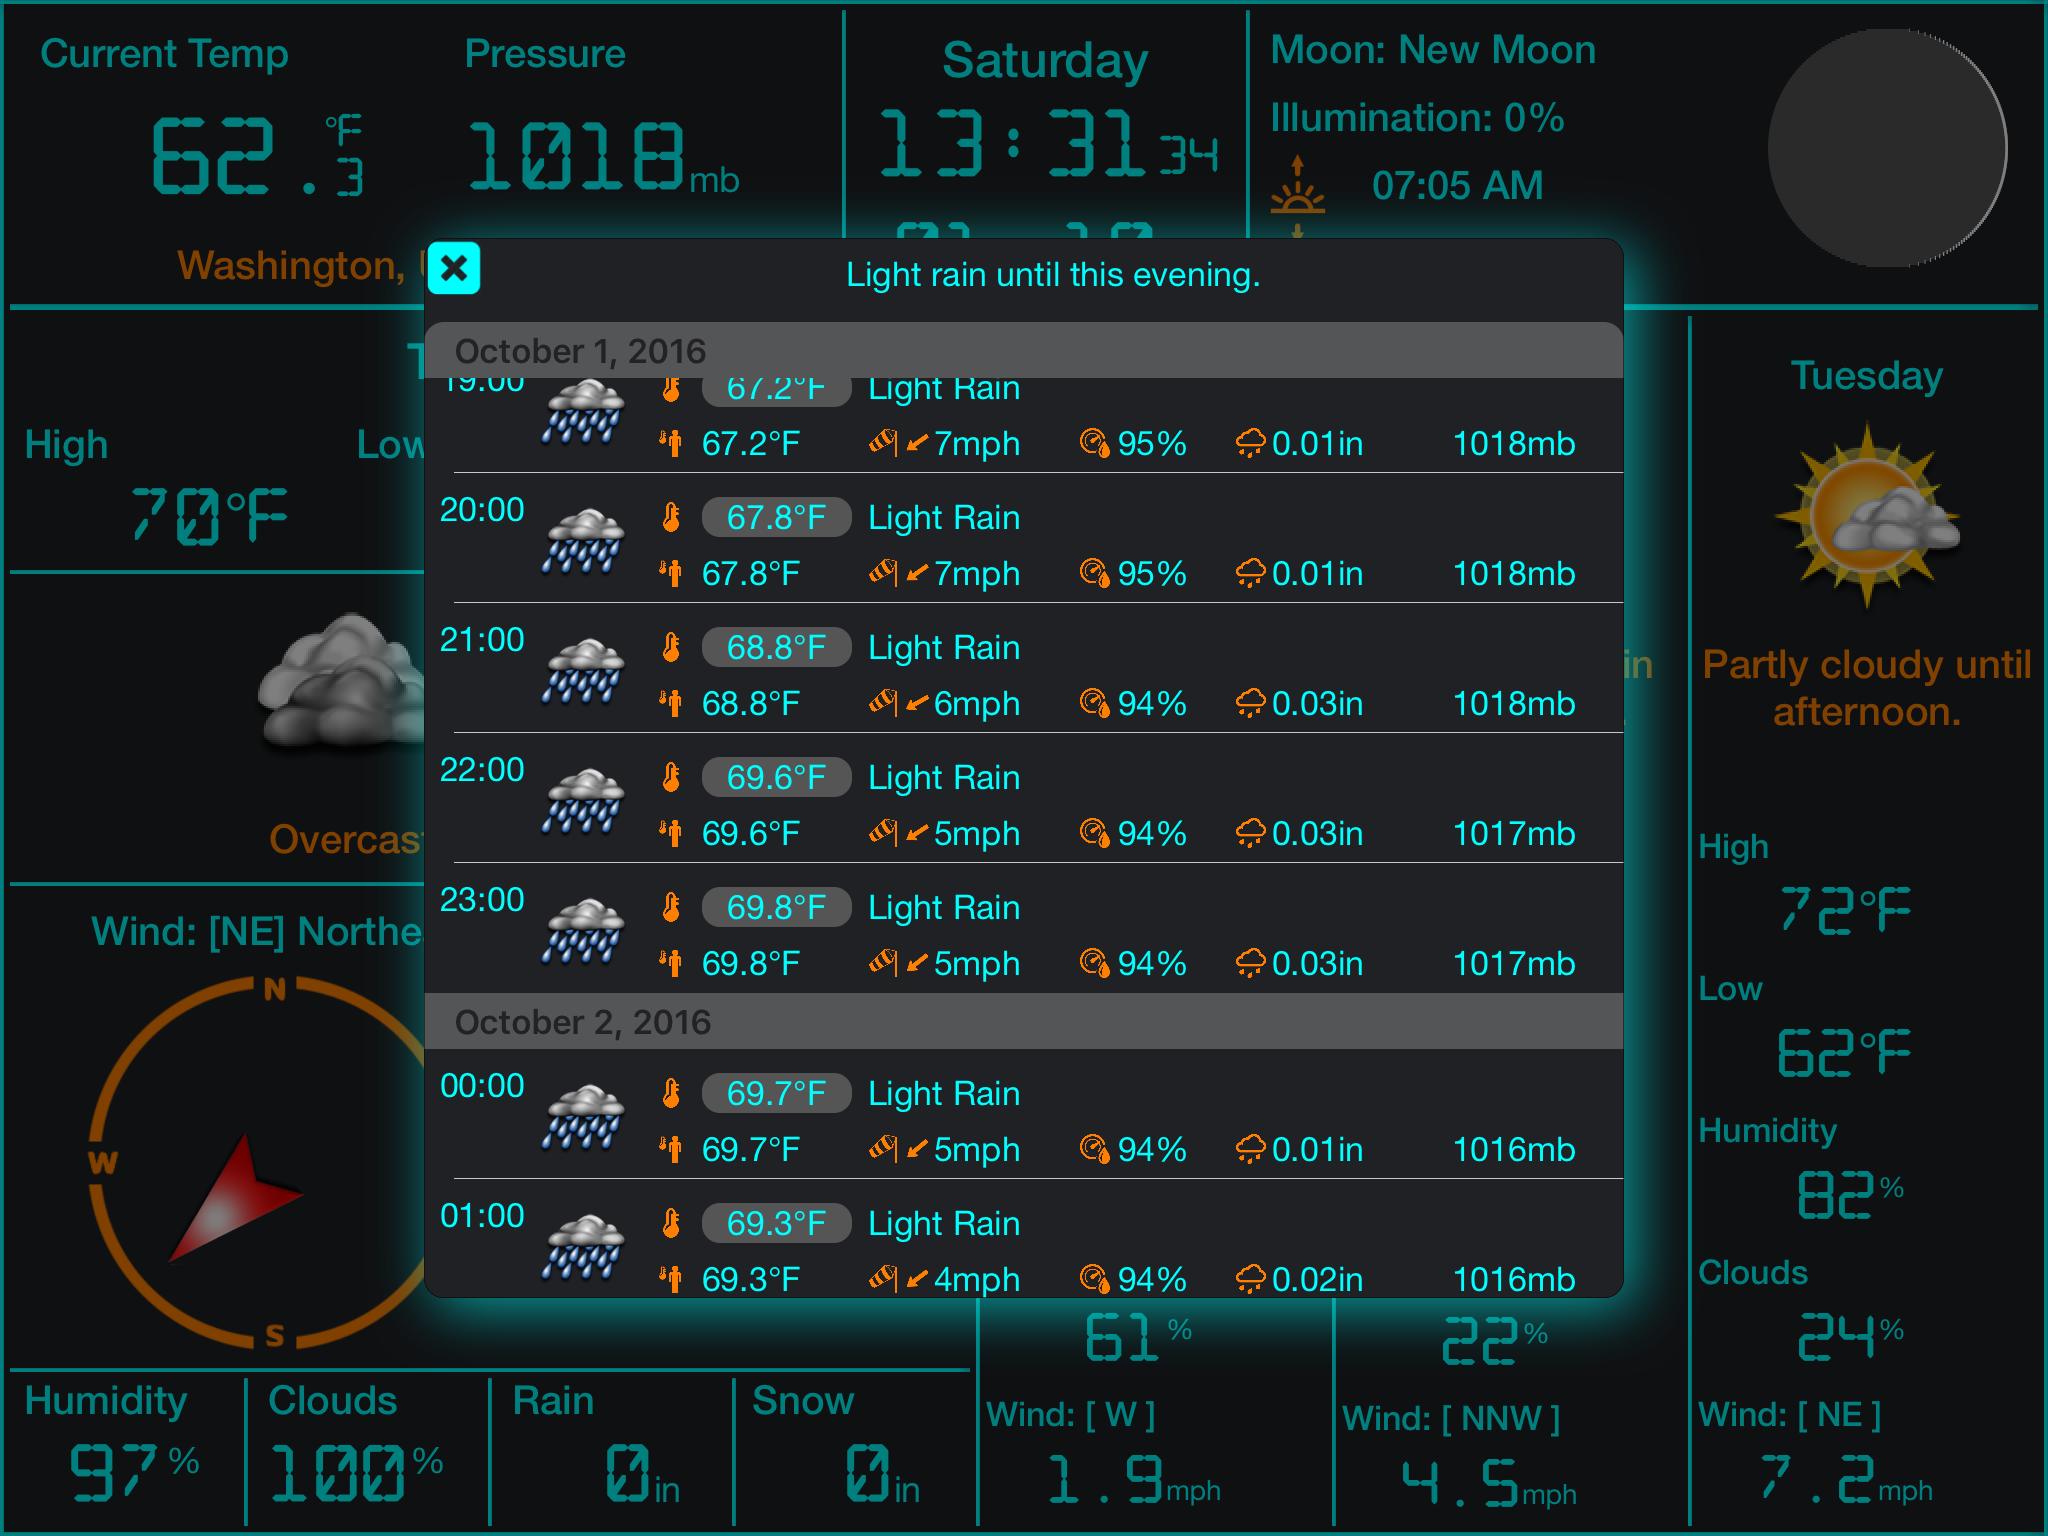 simulator-screen-shot-01-oct-2016-13-31-35